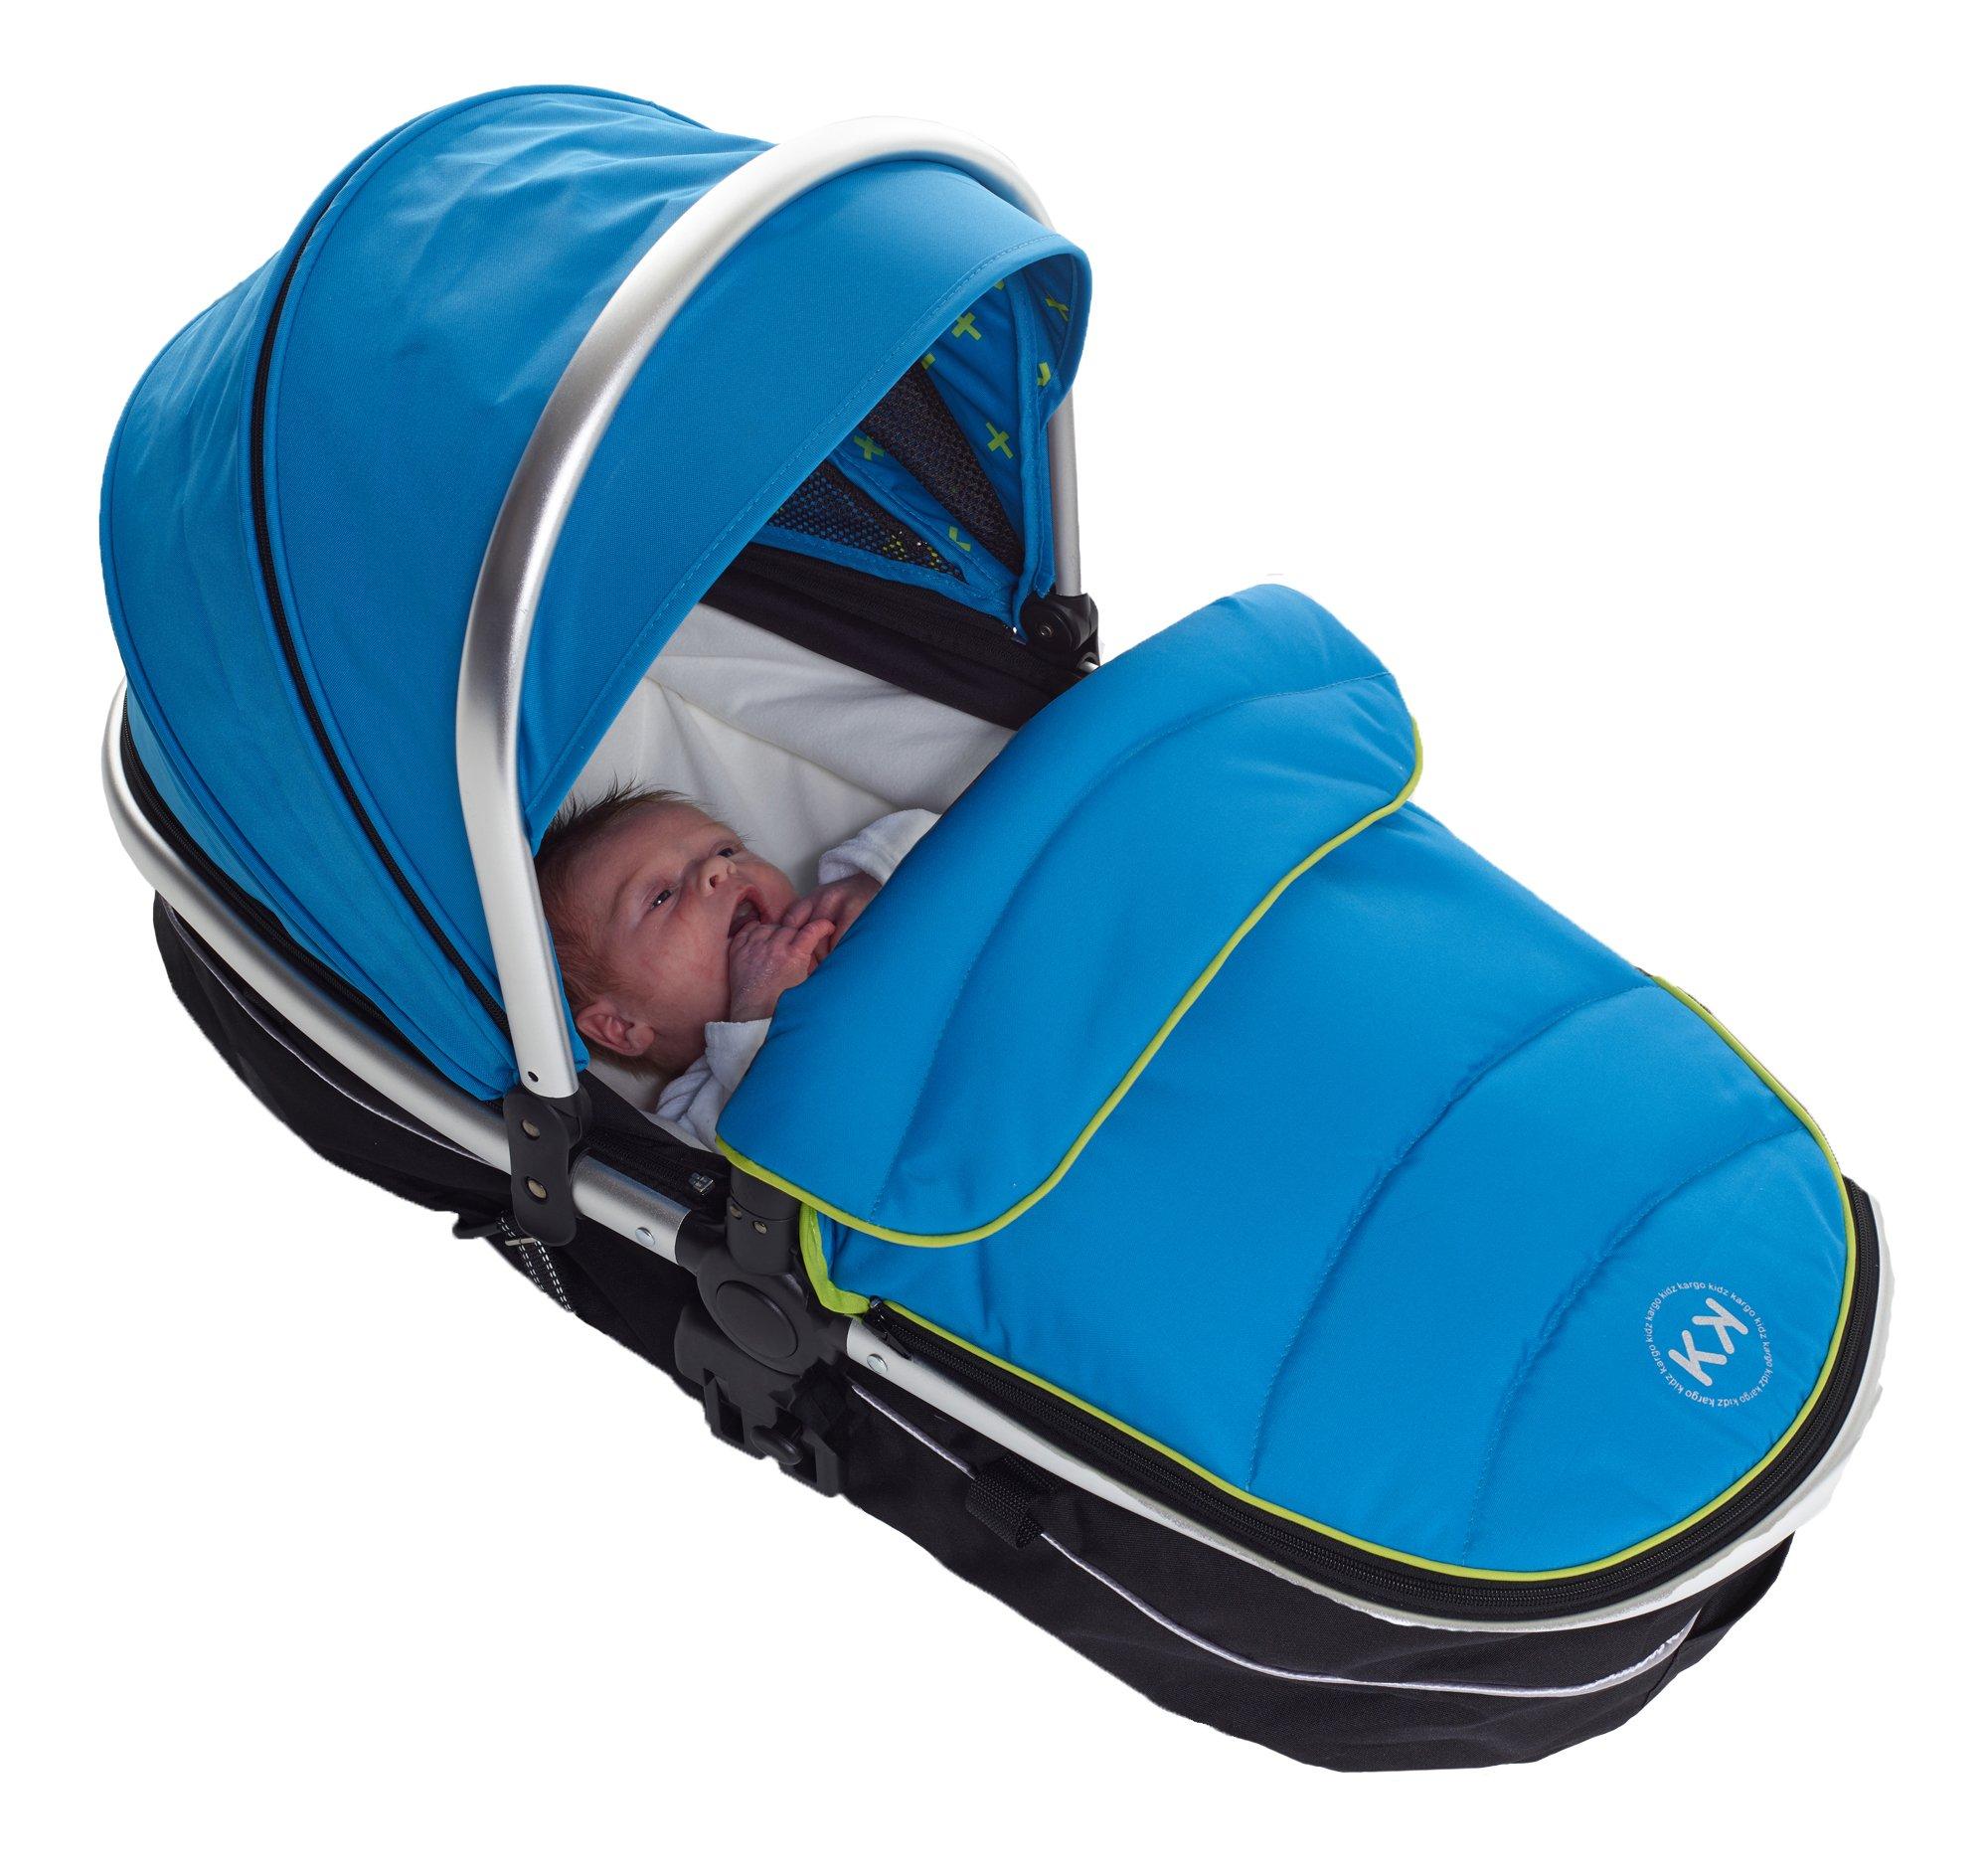 Kids Kargo Duellette 21 Combi Travel System Pram Double Pushchair (French Aqua)